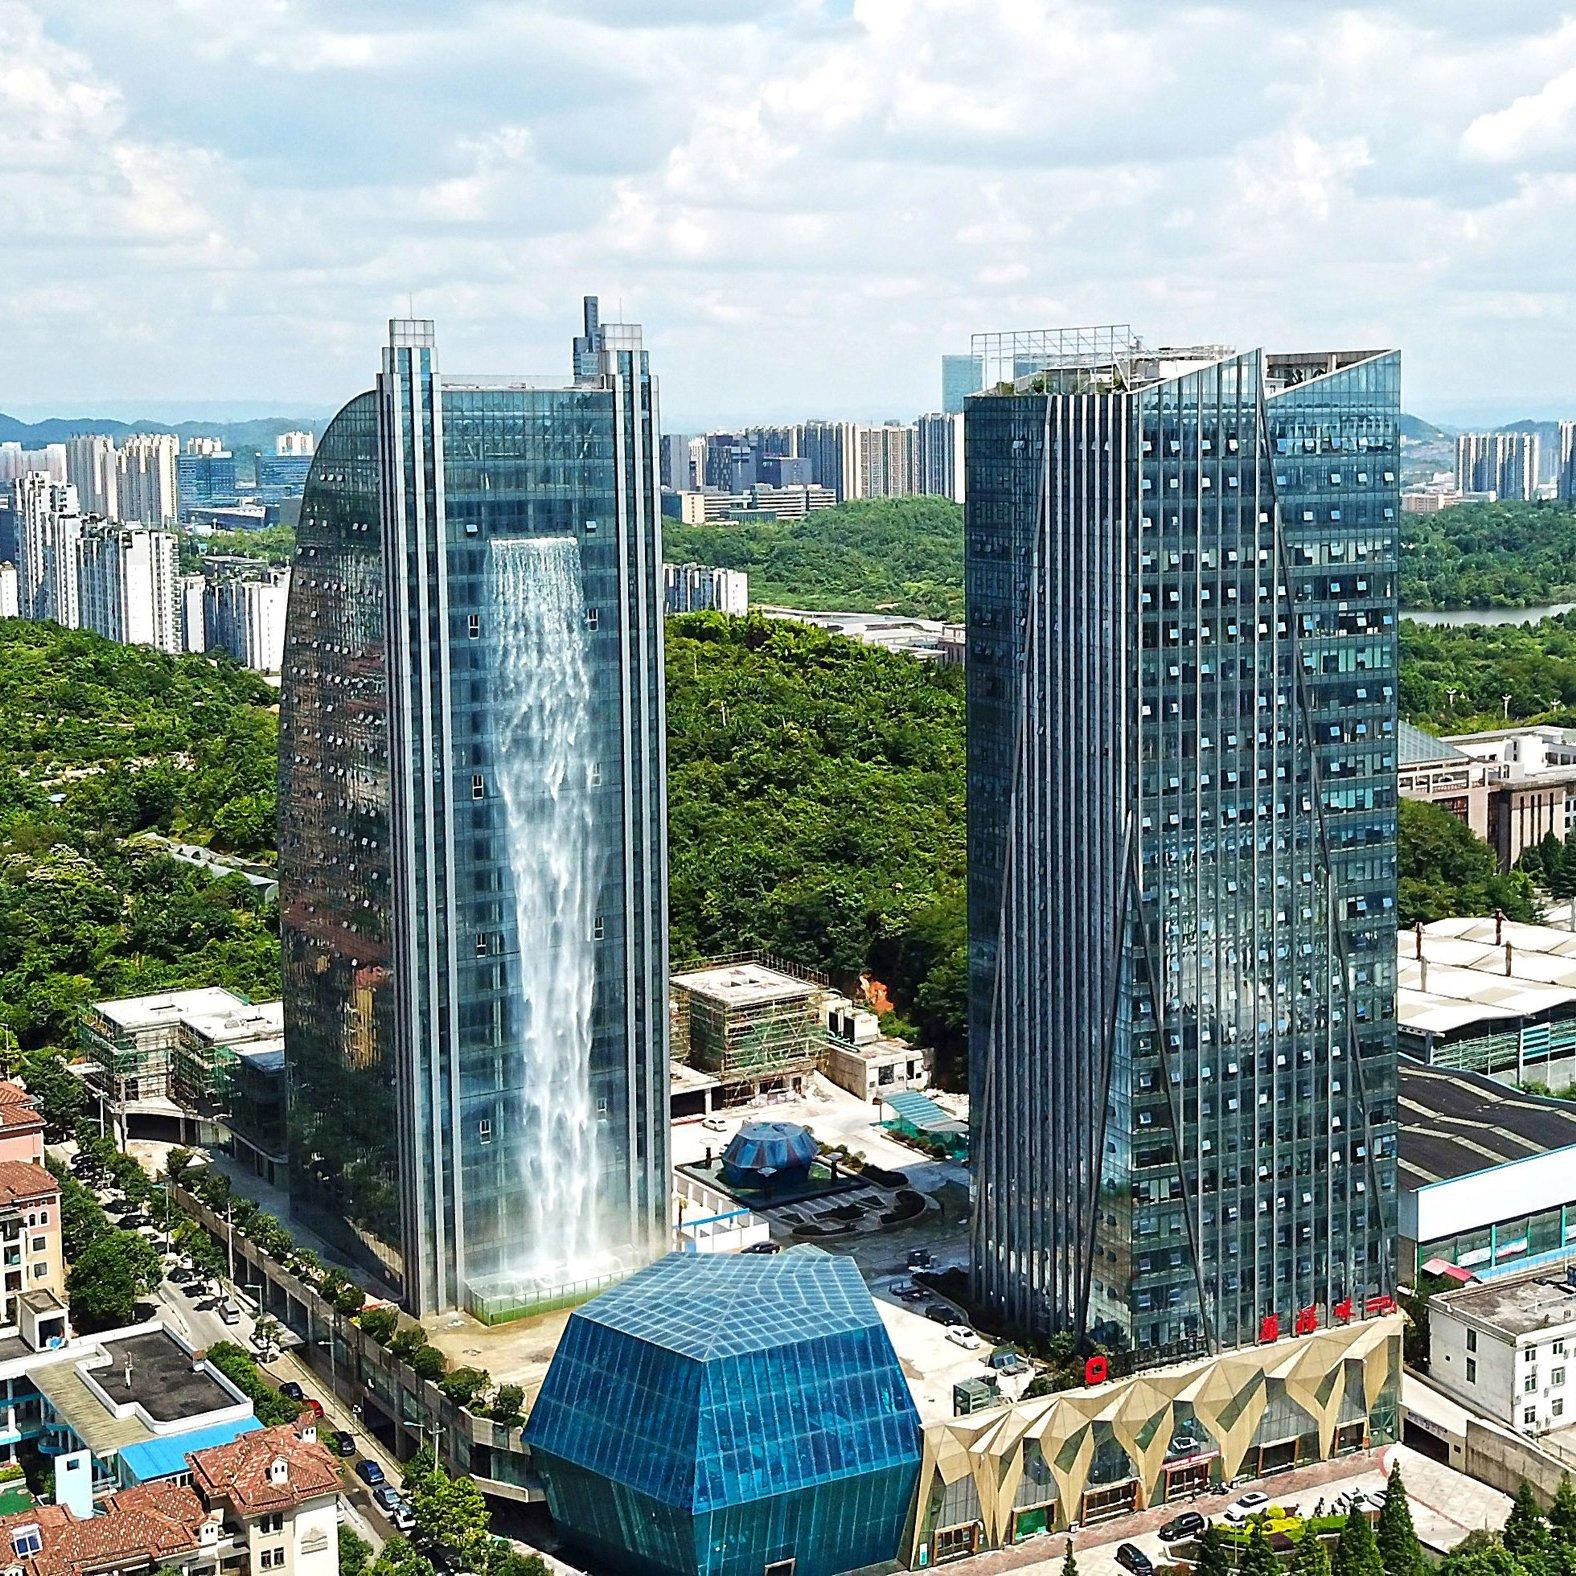 Waterfall architecture: Liebian International Building, China, by Ludi Industry Group